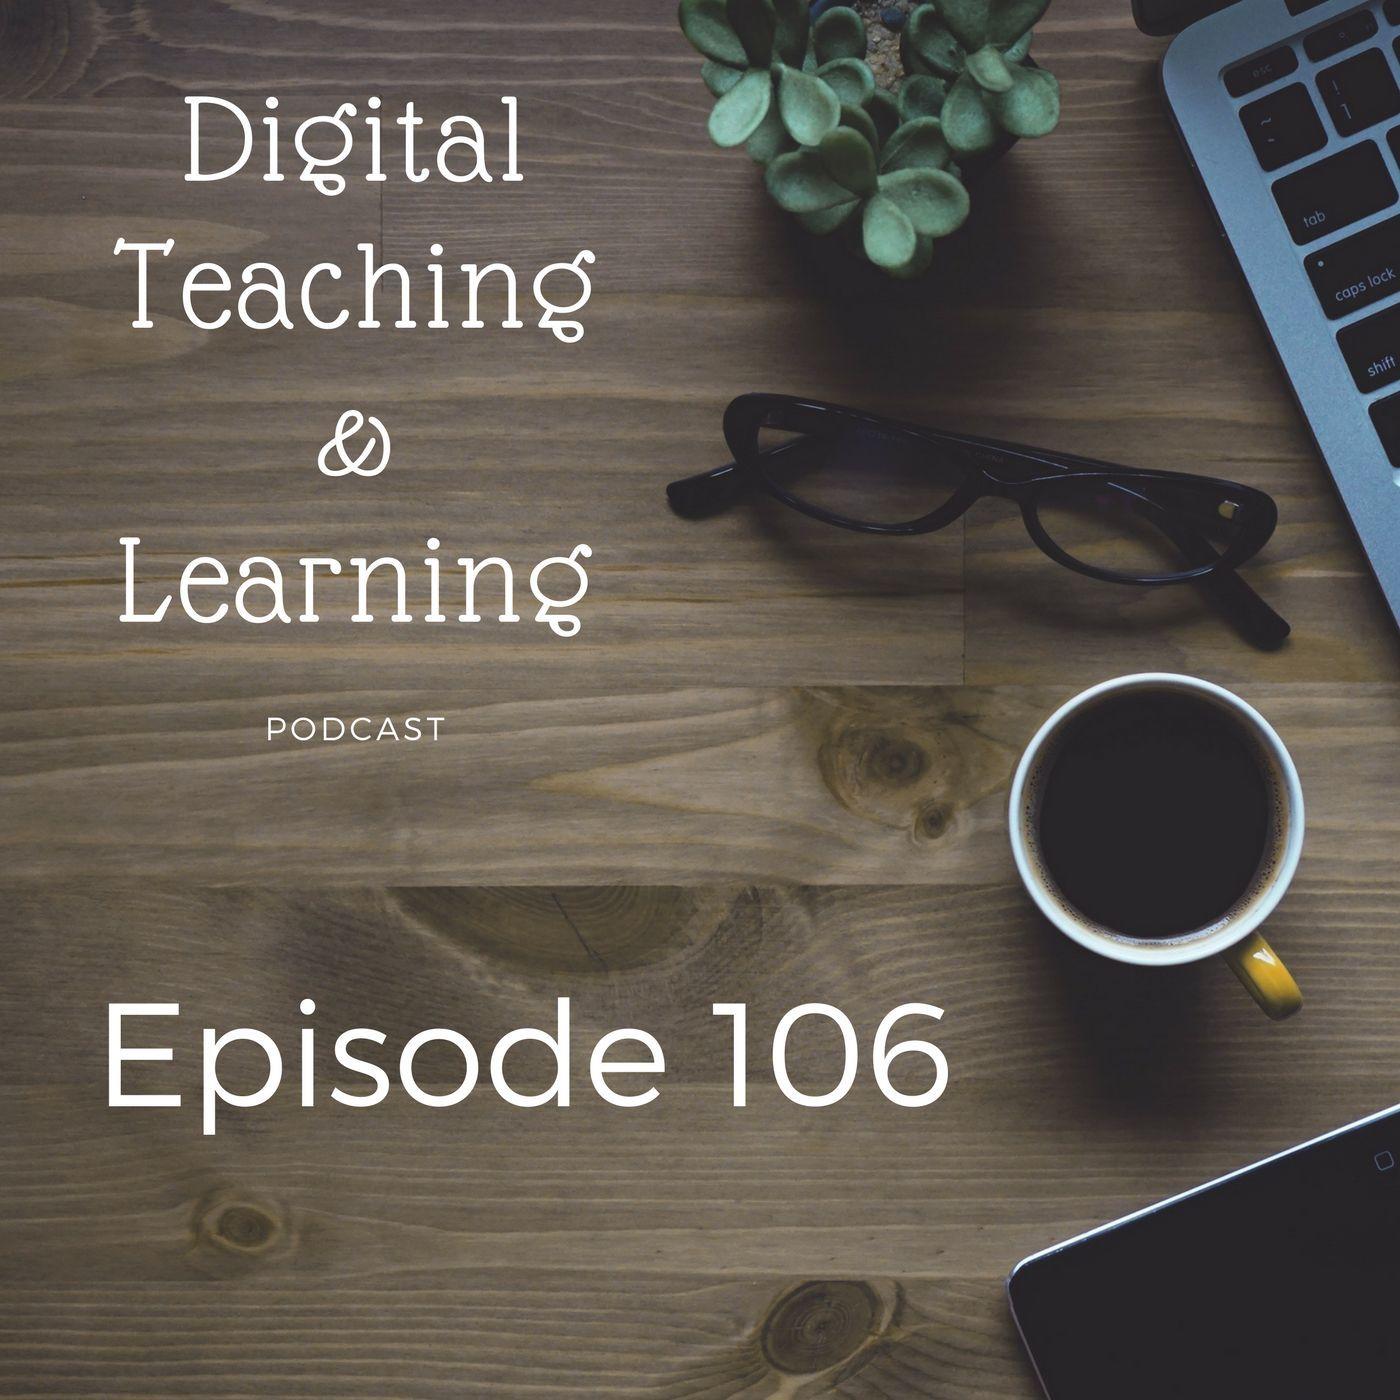 Episode 106 - Take a Risk as an Educator